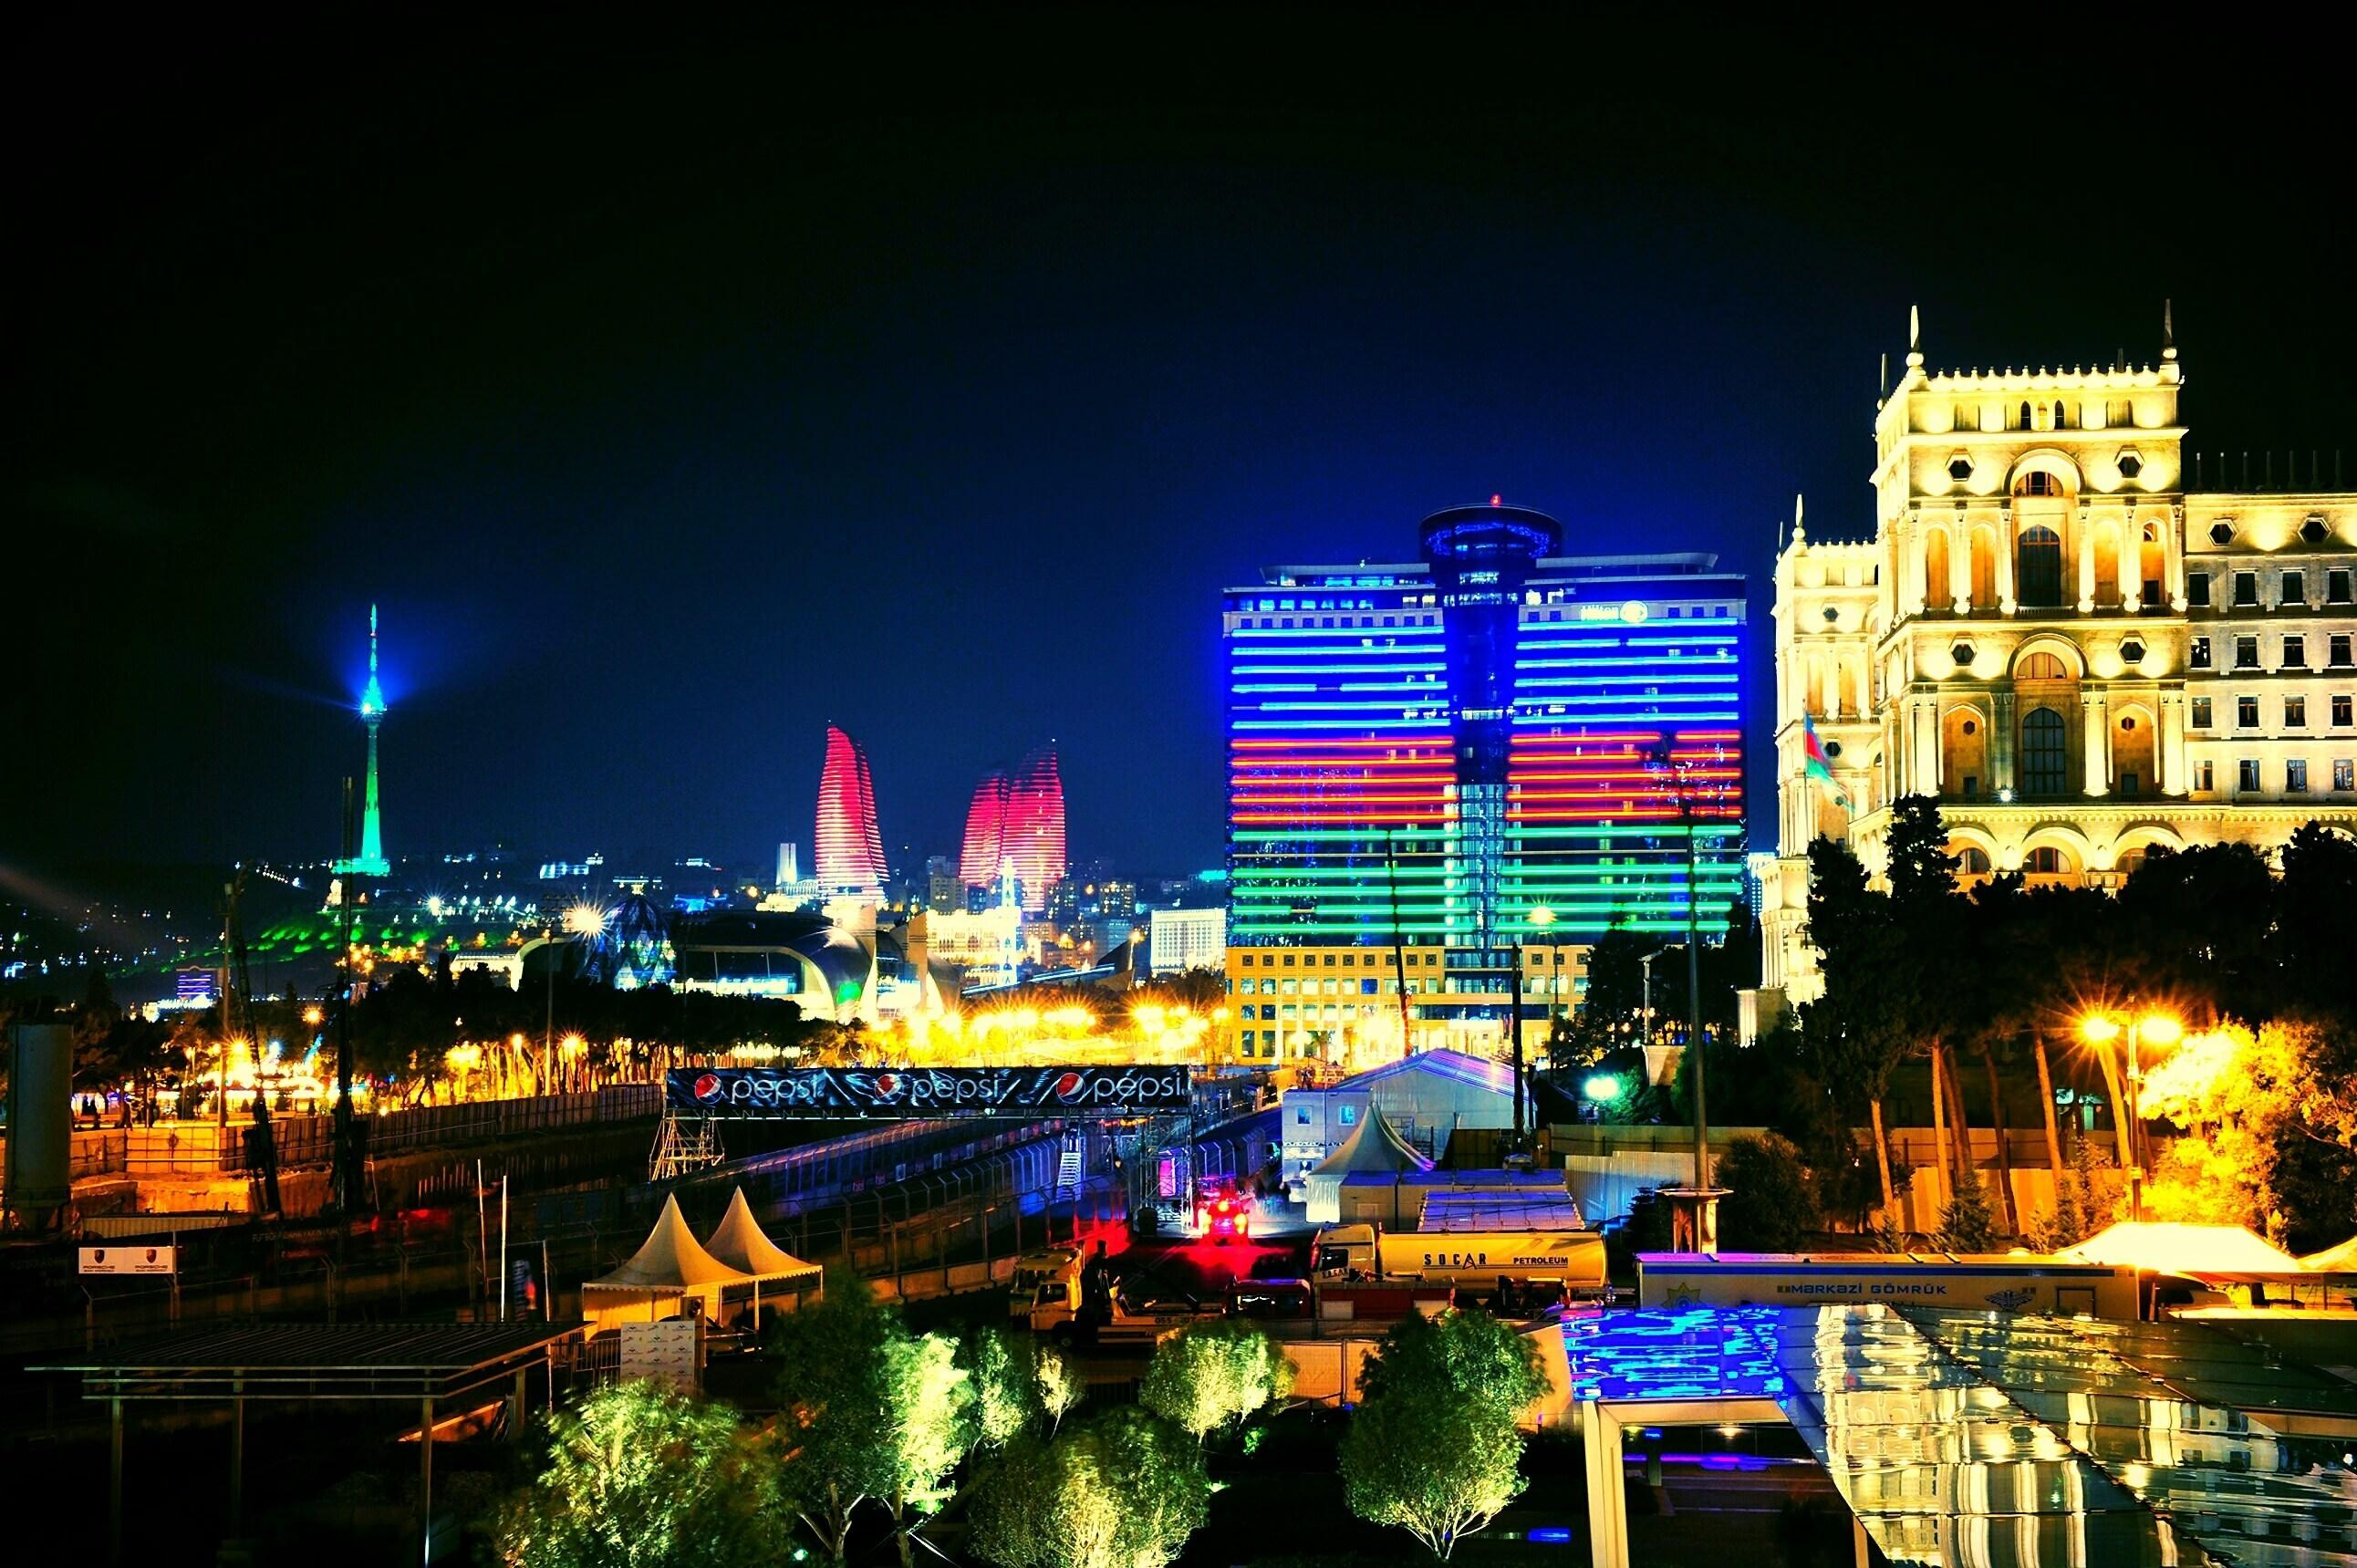 Wallpaper Azerbaijan Baku fires night City nature landscape 2584x1719